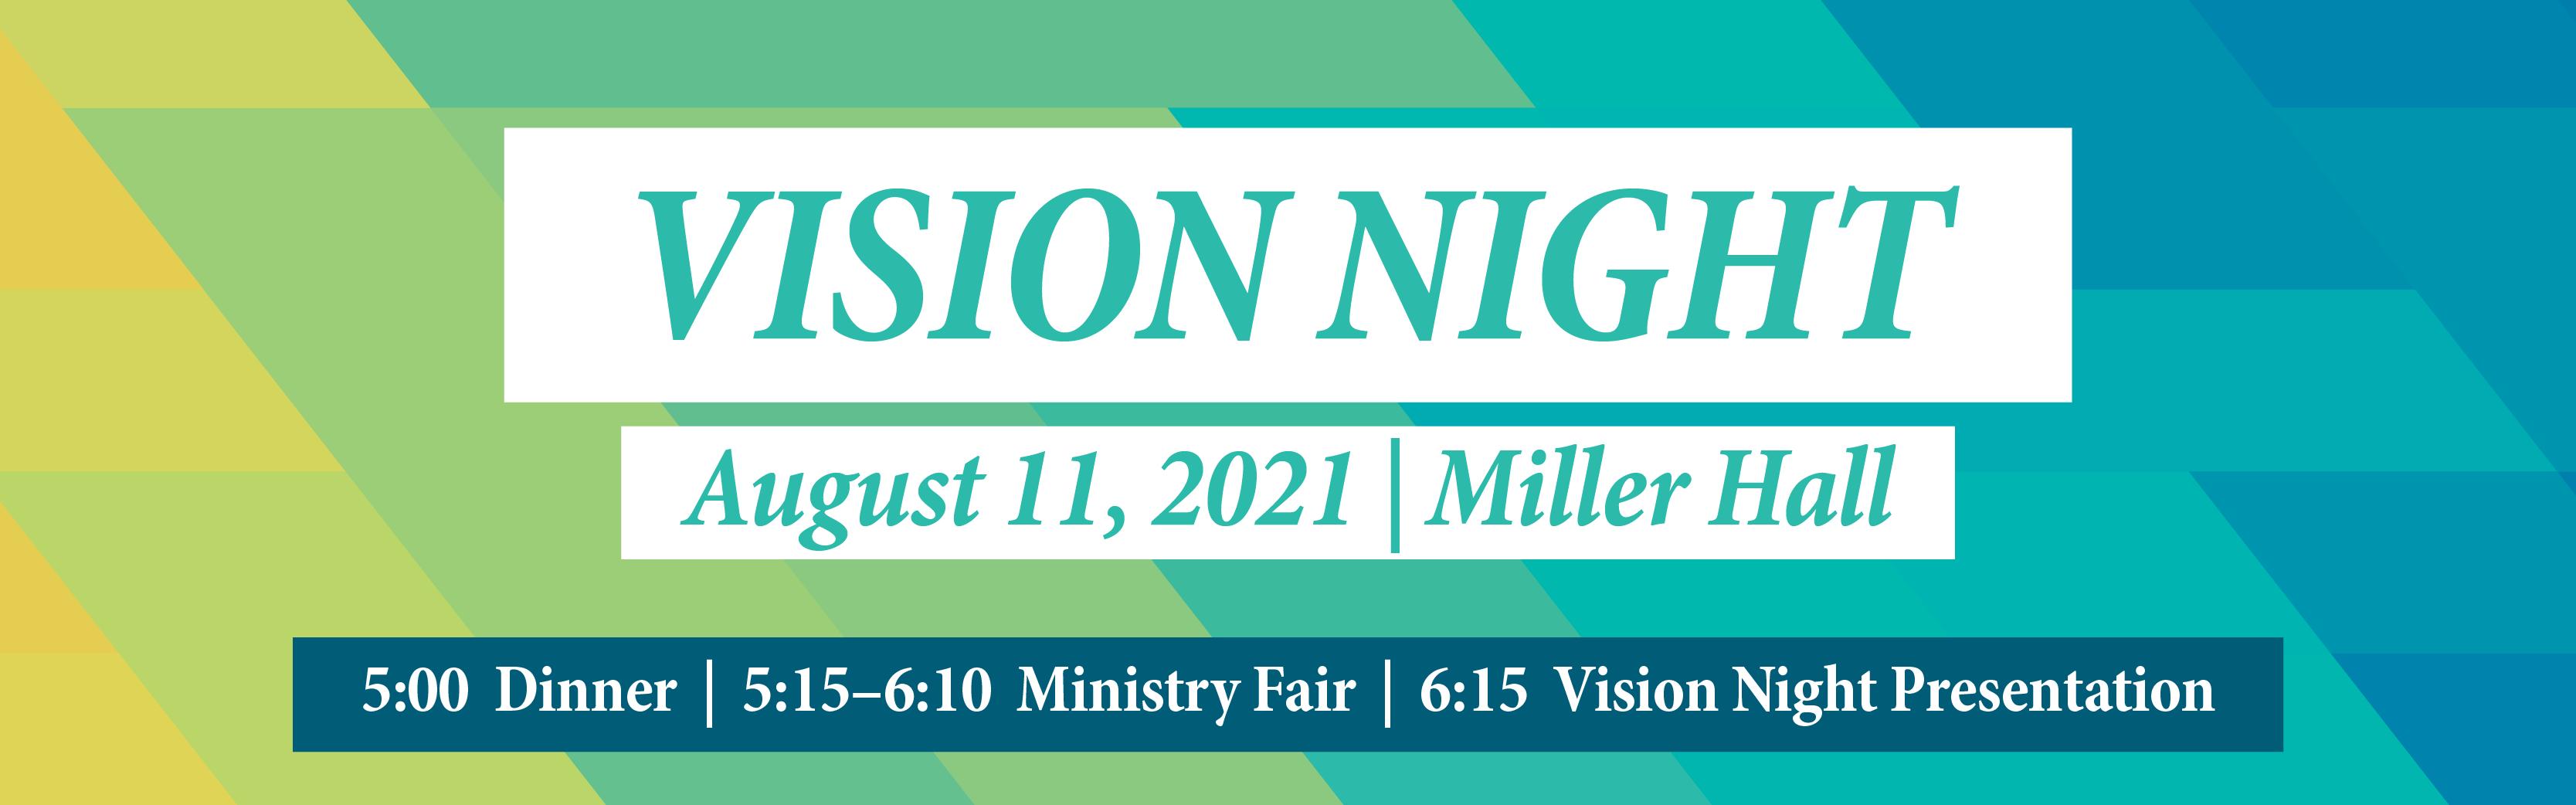 Vision Night 2021